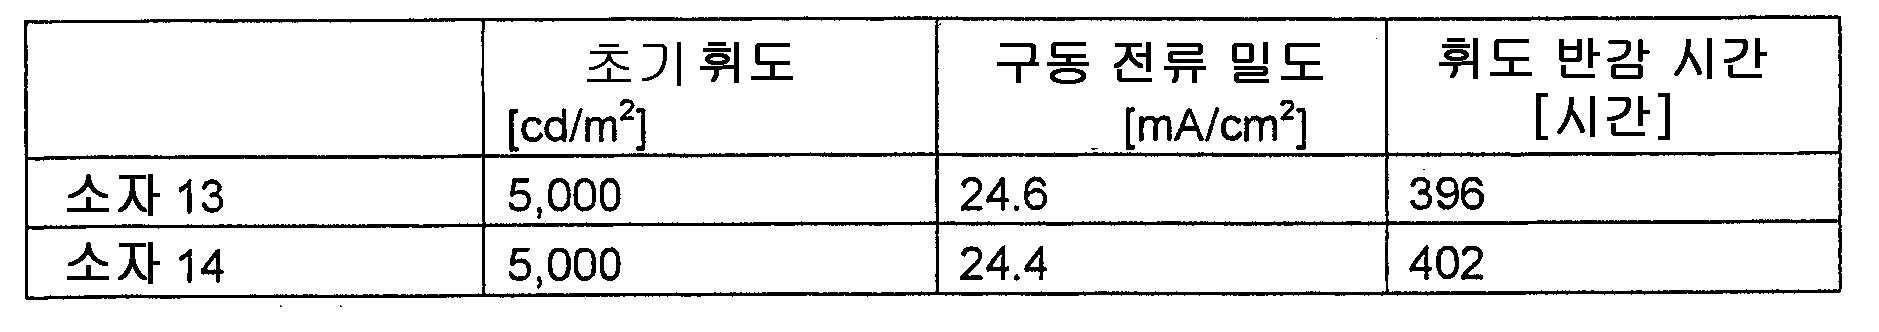 Figure 112010002231902-pat00176